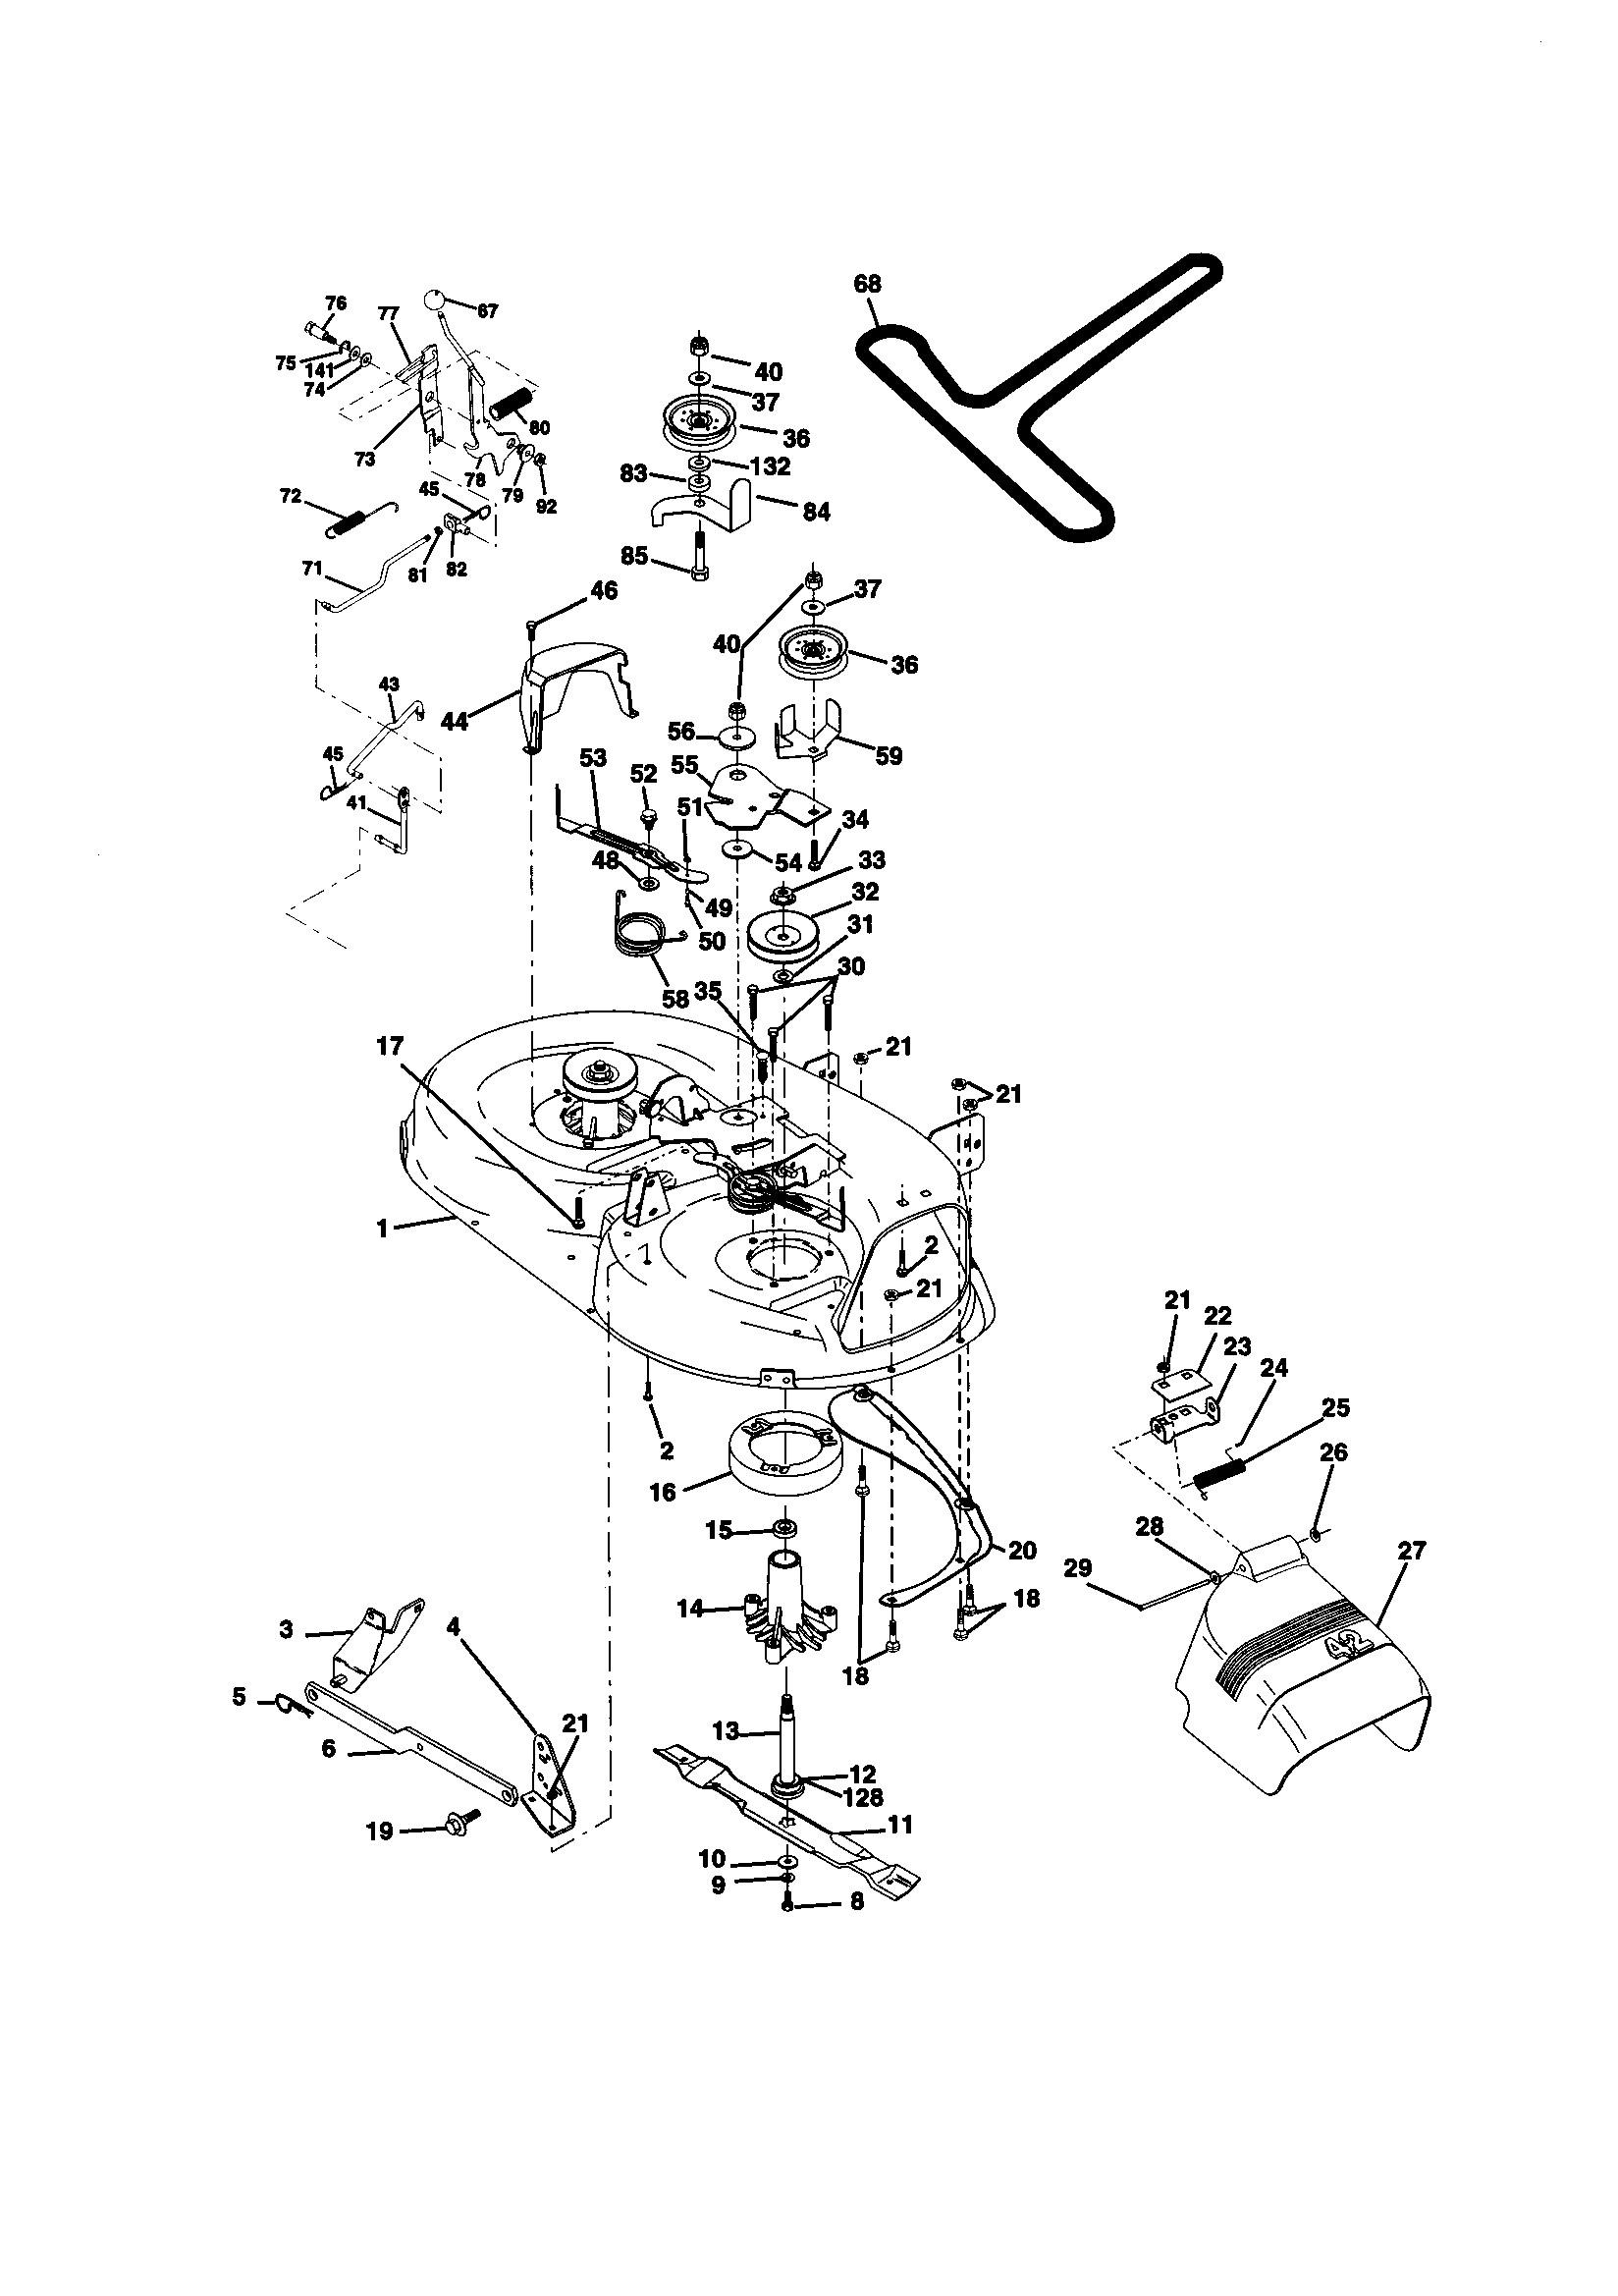 Craftsman Ltx 1000 Parts Diagram Looking for Craftsman Model Front Engine Lawn Tractor Of Craftsman Ltx 1000 Parts Diagram